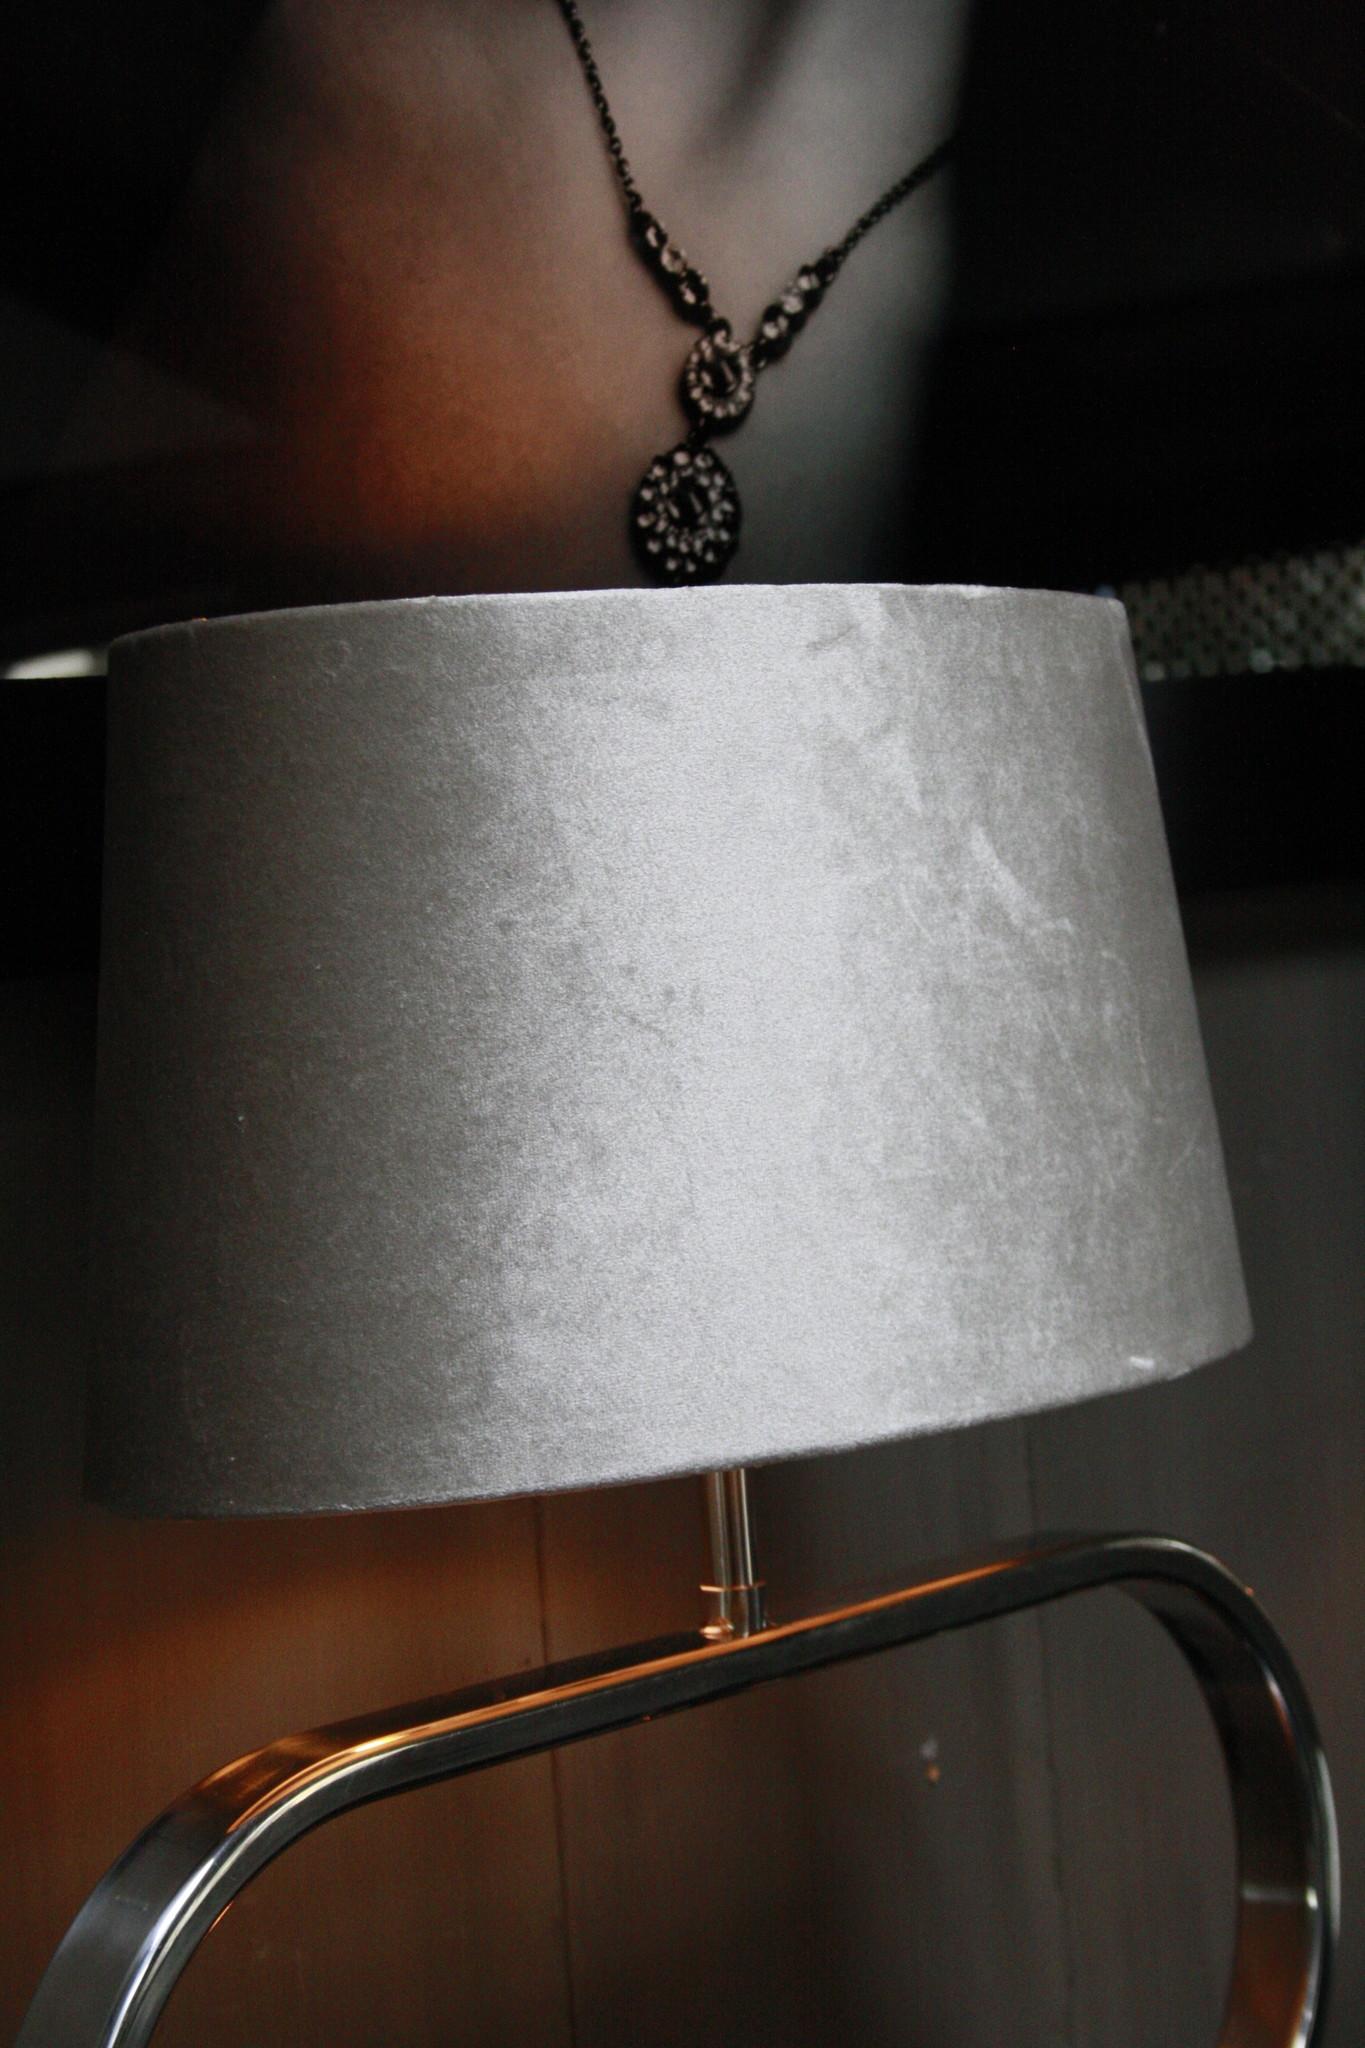 Tafellamp Ovaal RVS + Velours kap Eric Kuster Stijl-4